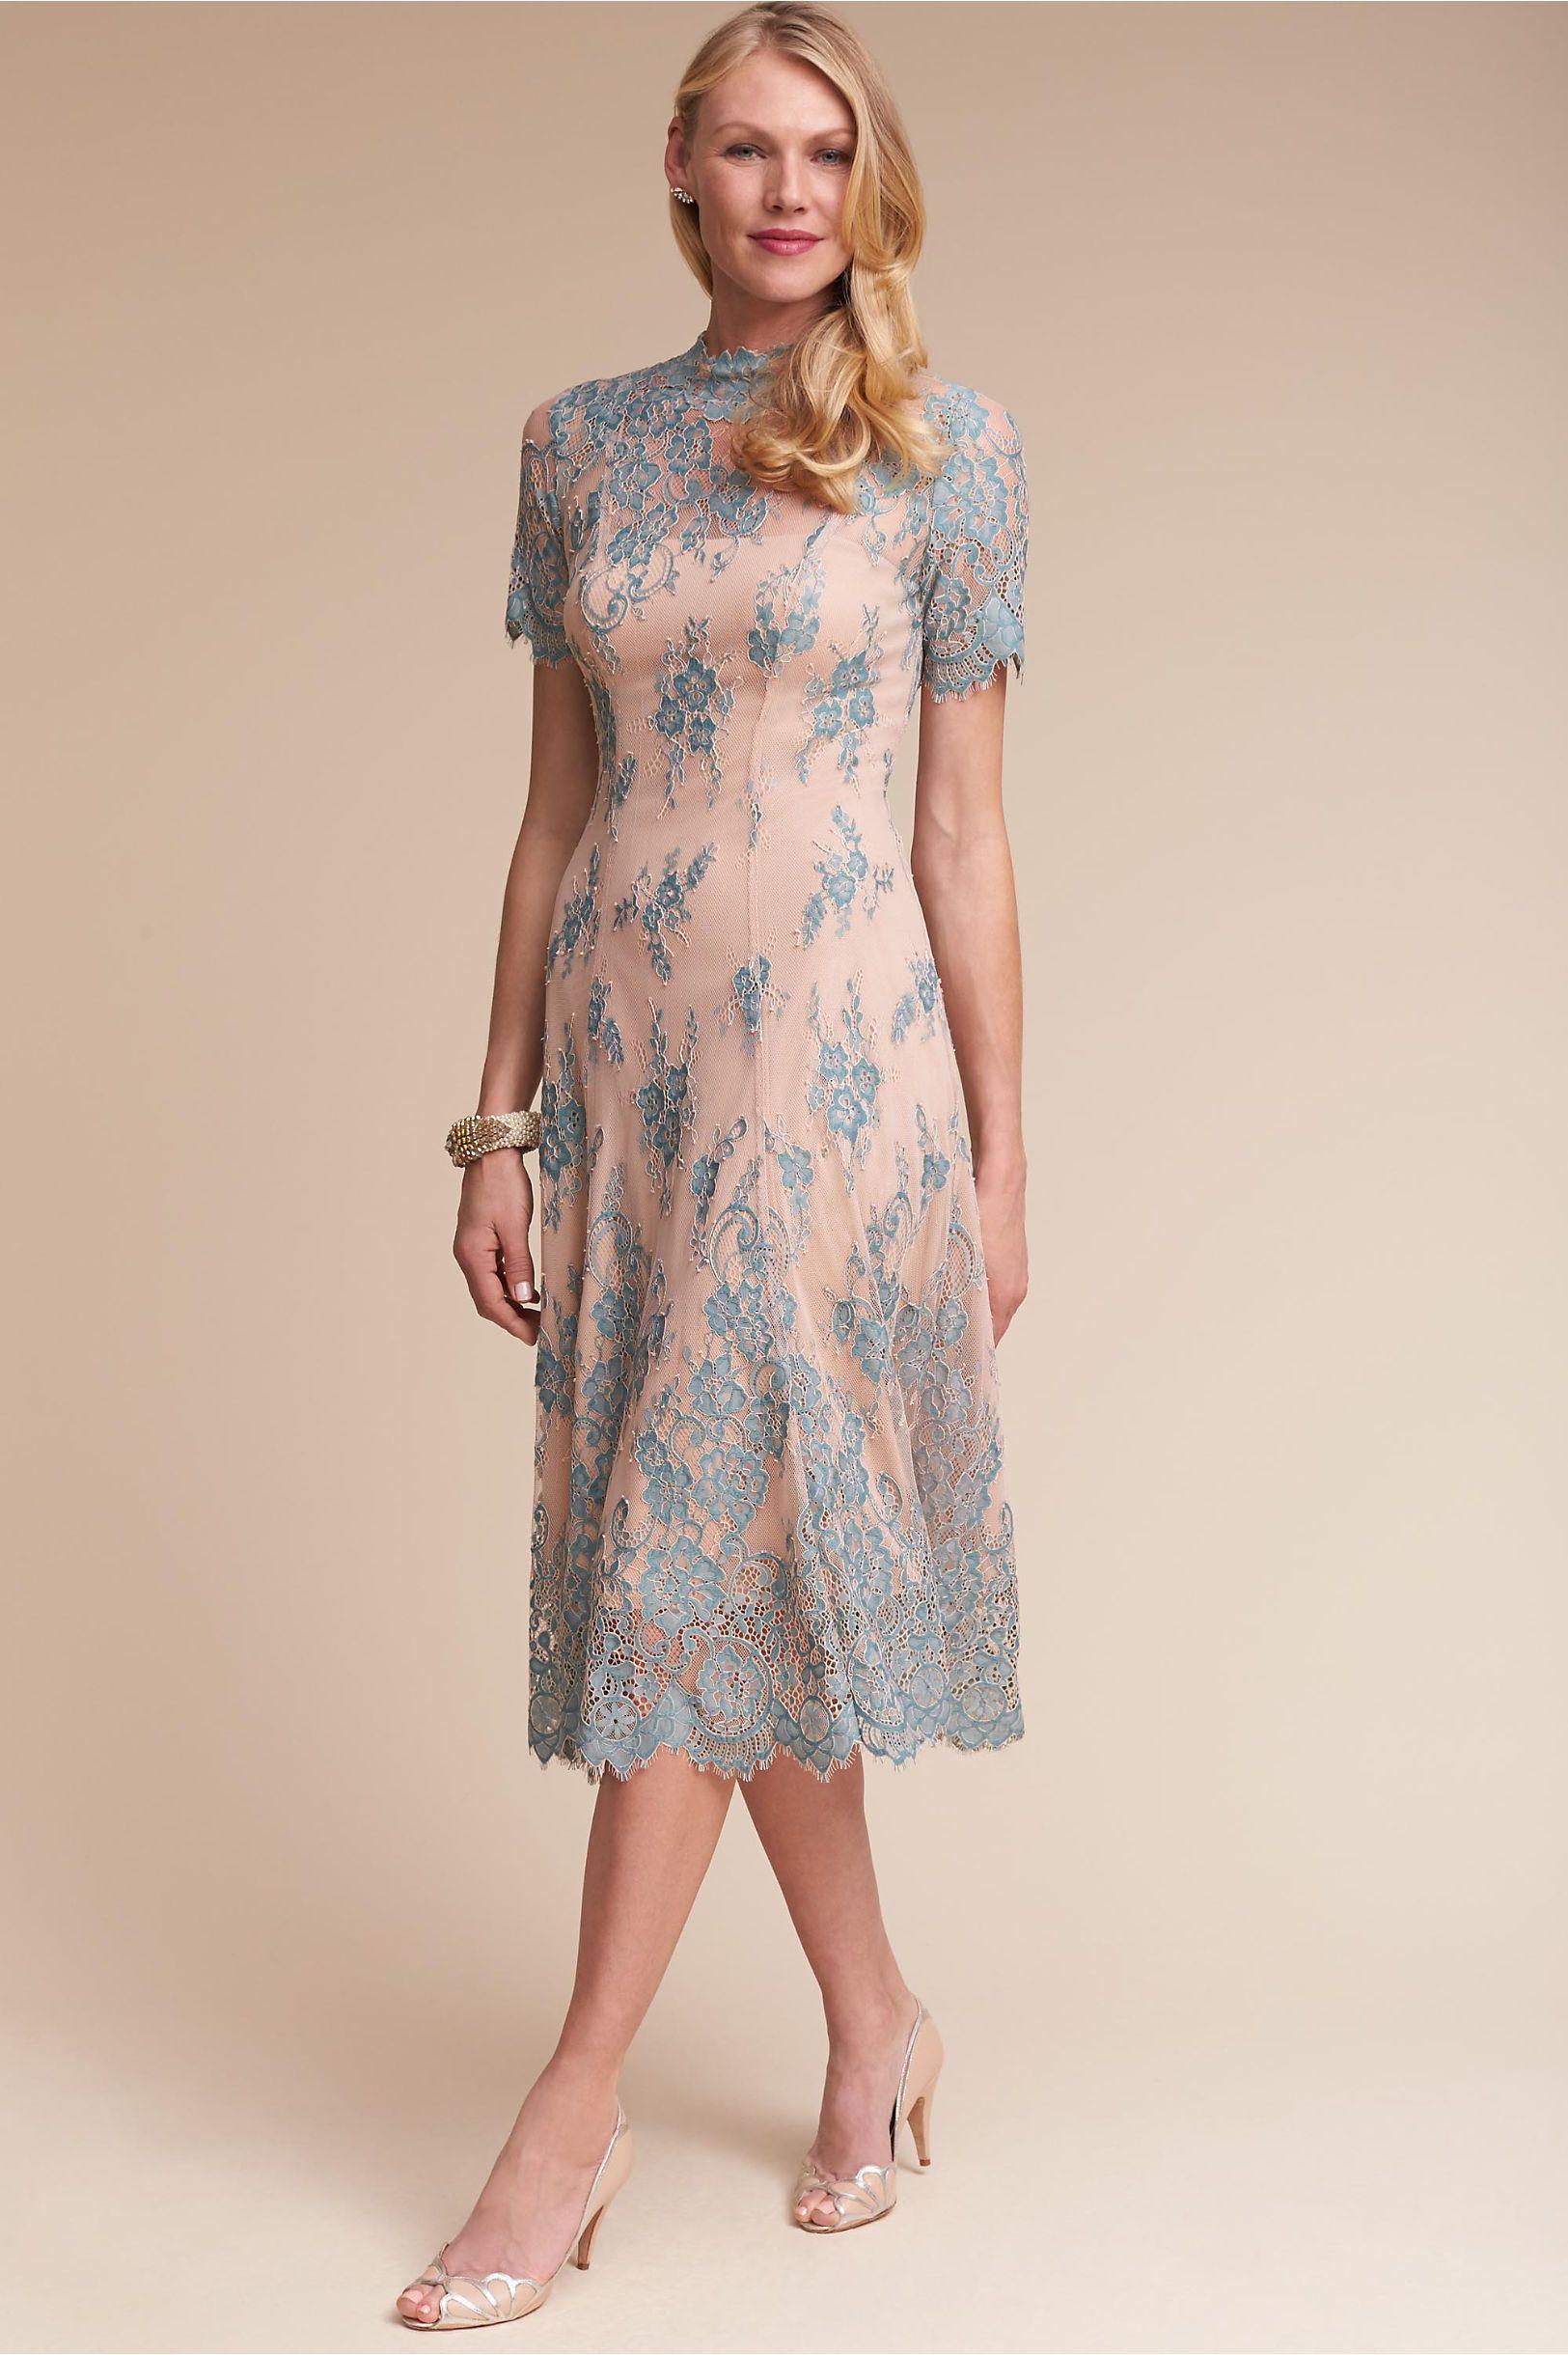 Bhldn Allison Dress In Dresses Mother Of The Bride Dresses